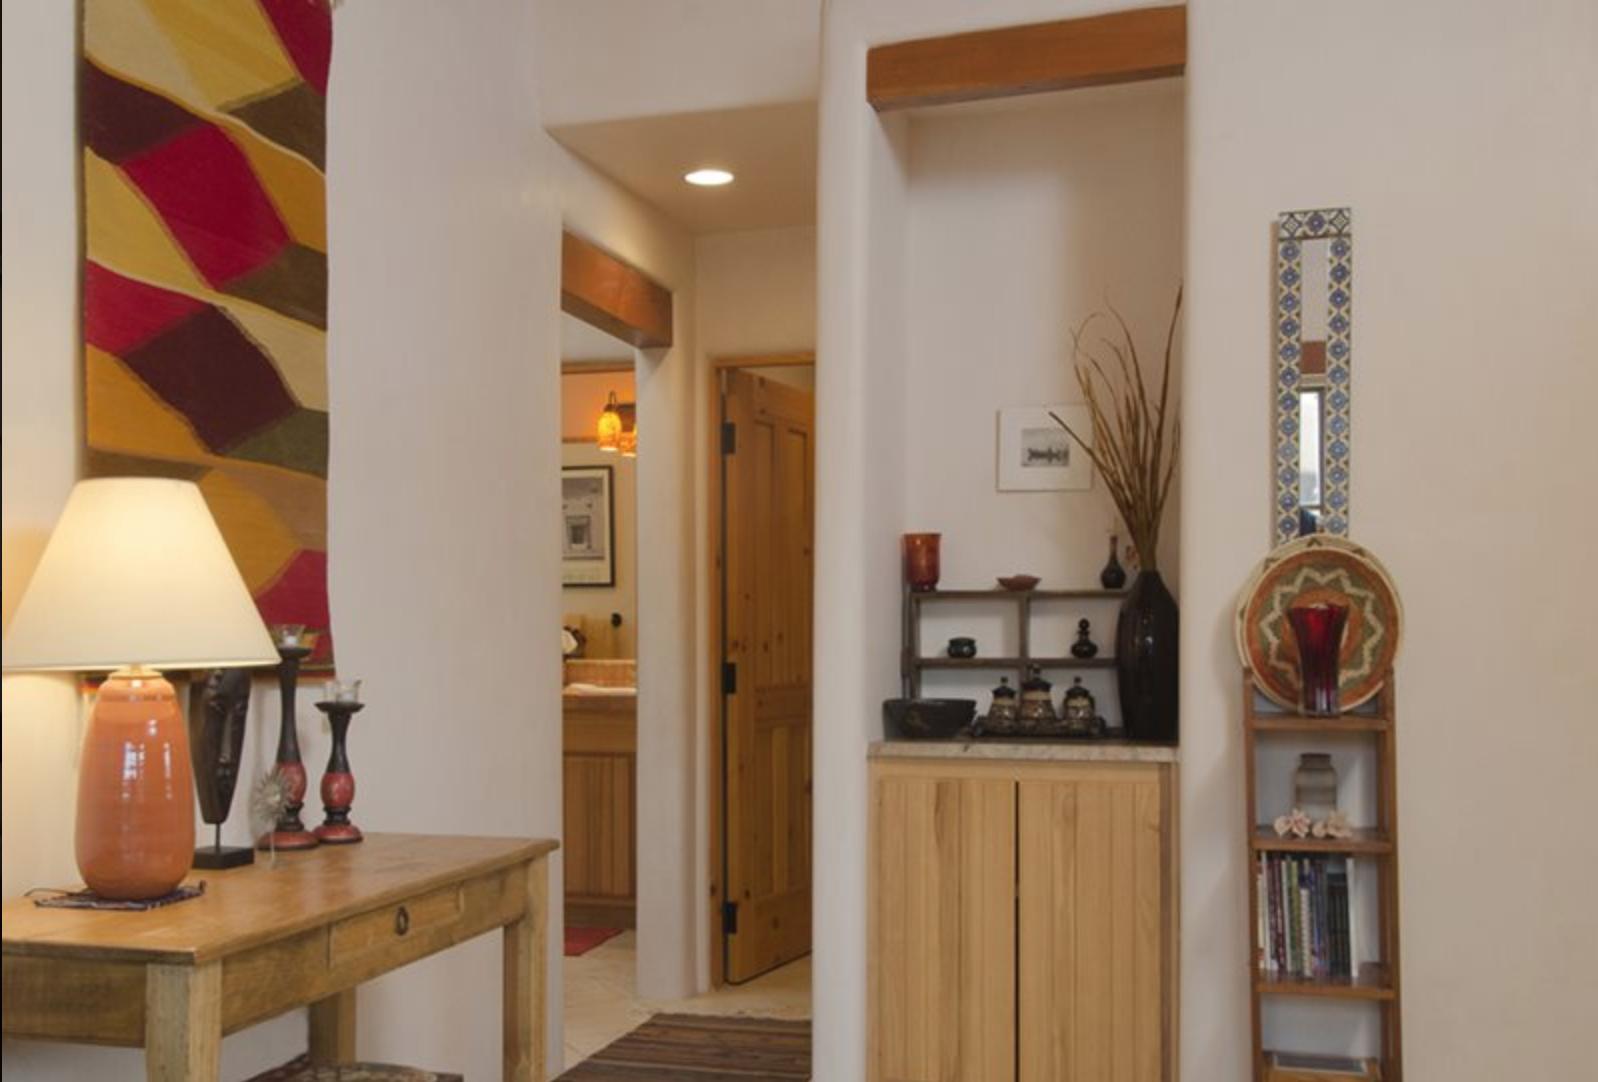 Vacation Rental in Santa Fe NM | Adobe Destinations